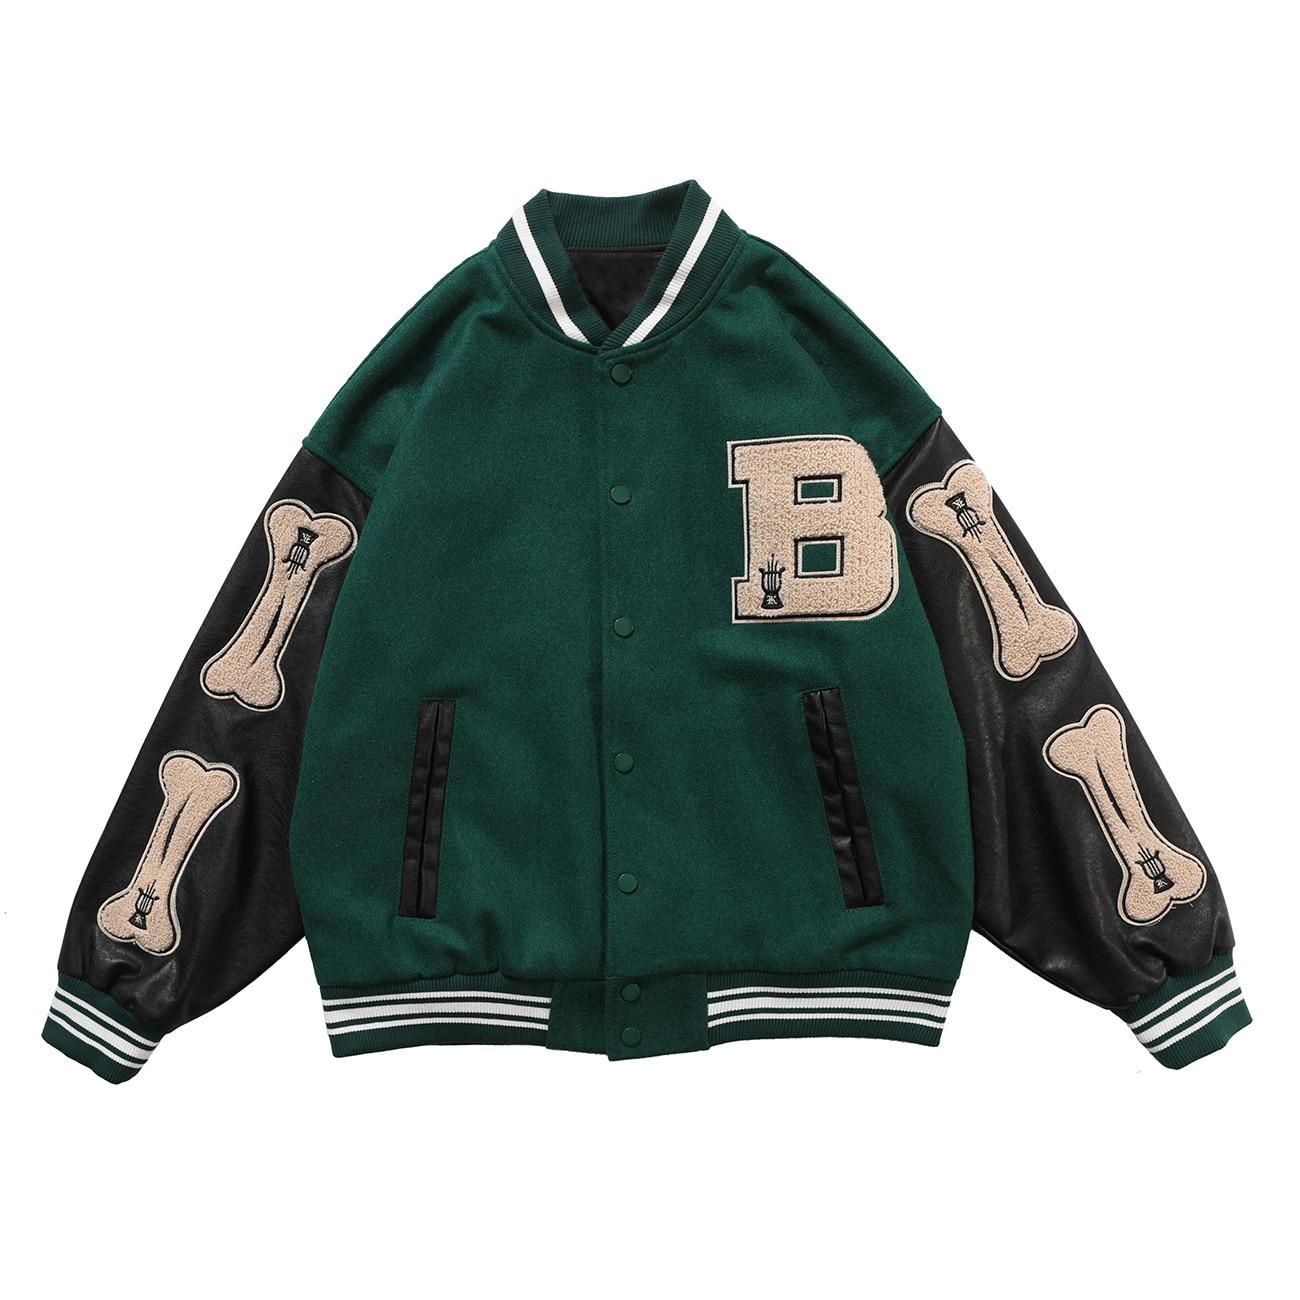 LACIBLE 2020SS Hip Hop Furry Bone Patchwork Color Block Jackets Mens Harajuku Streetwear Bomber Jacket Men Baseball Coats Unisex